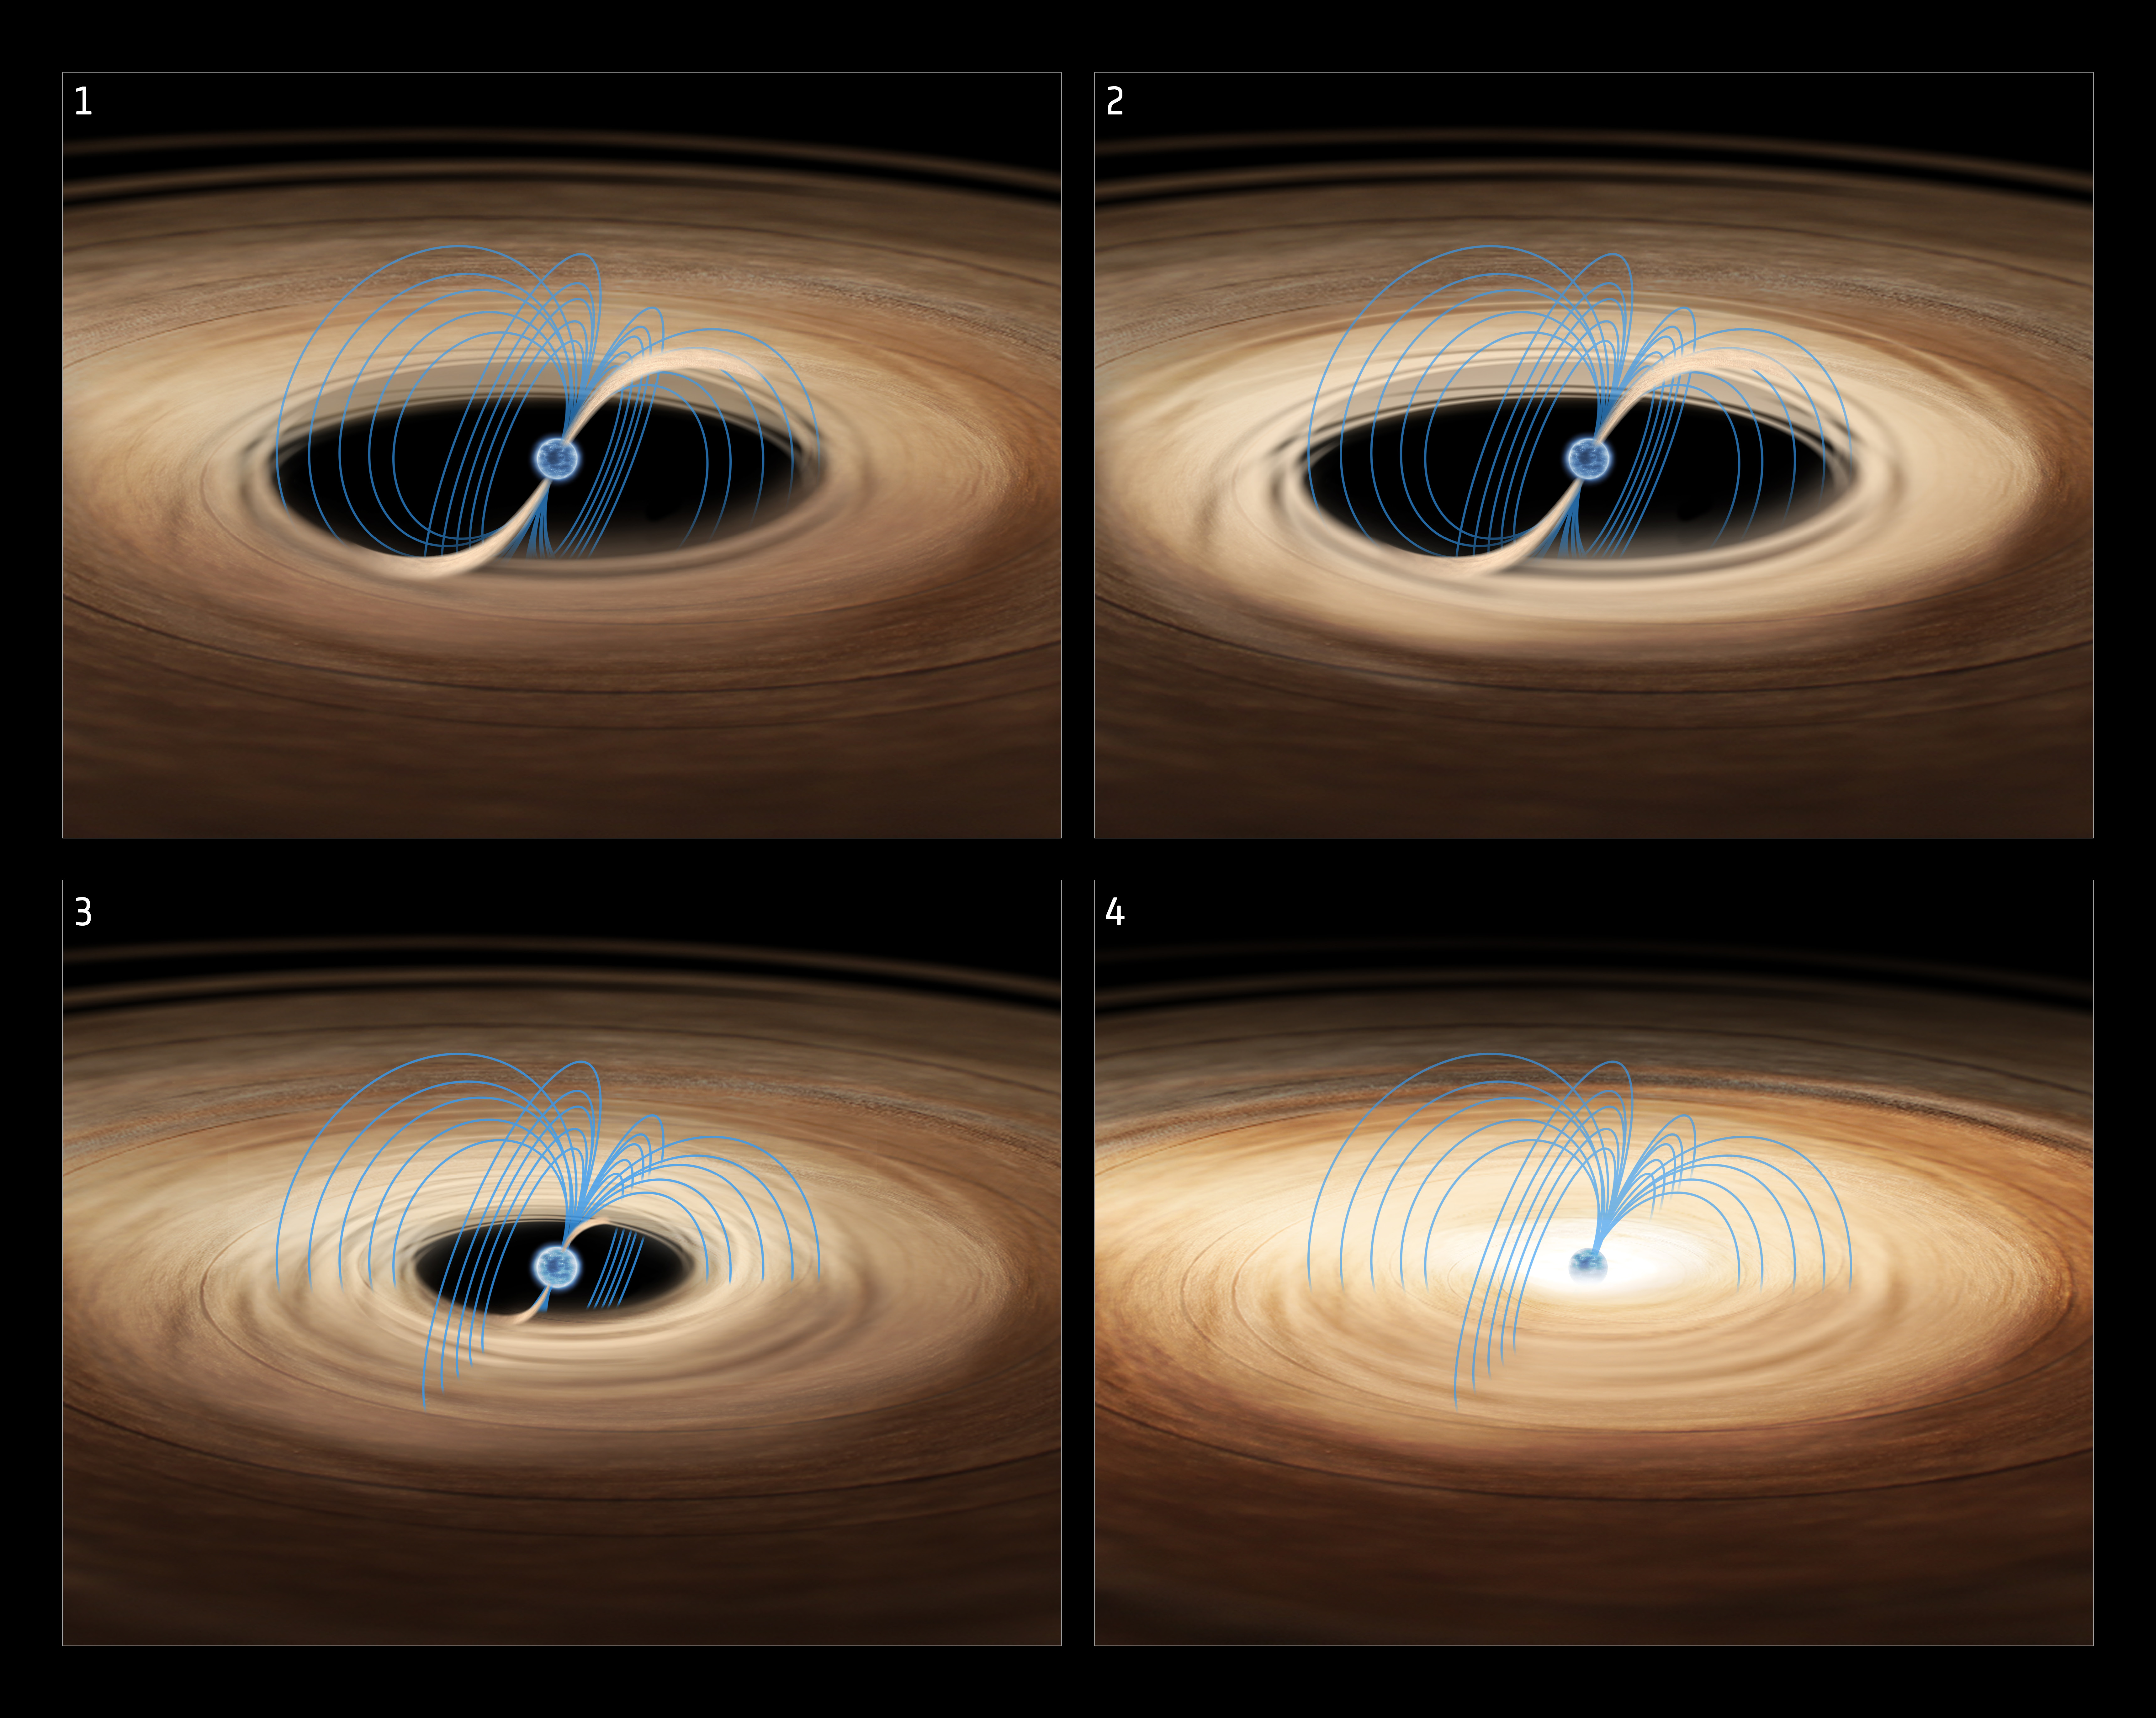 1567214650772-ESA_Rapid_Burster_neutron_star.jpg